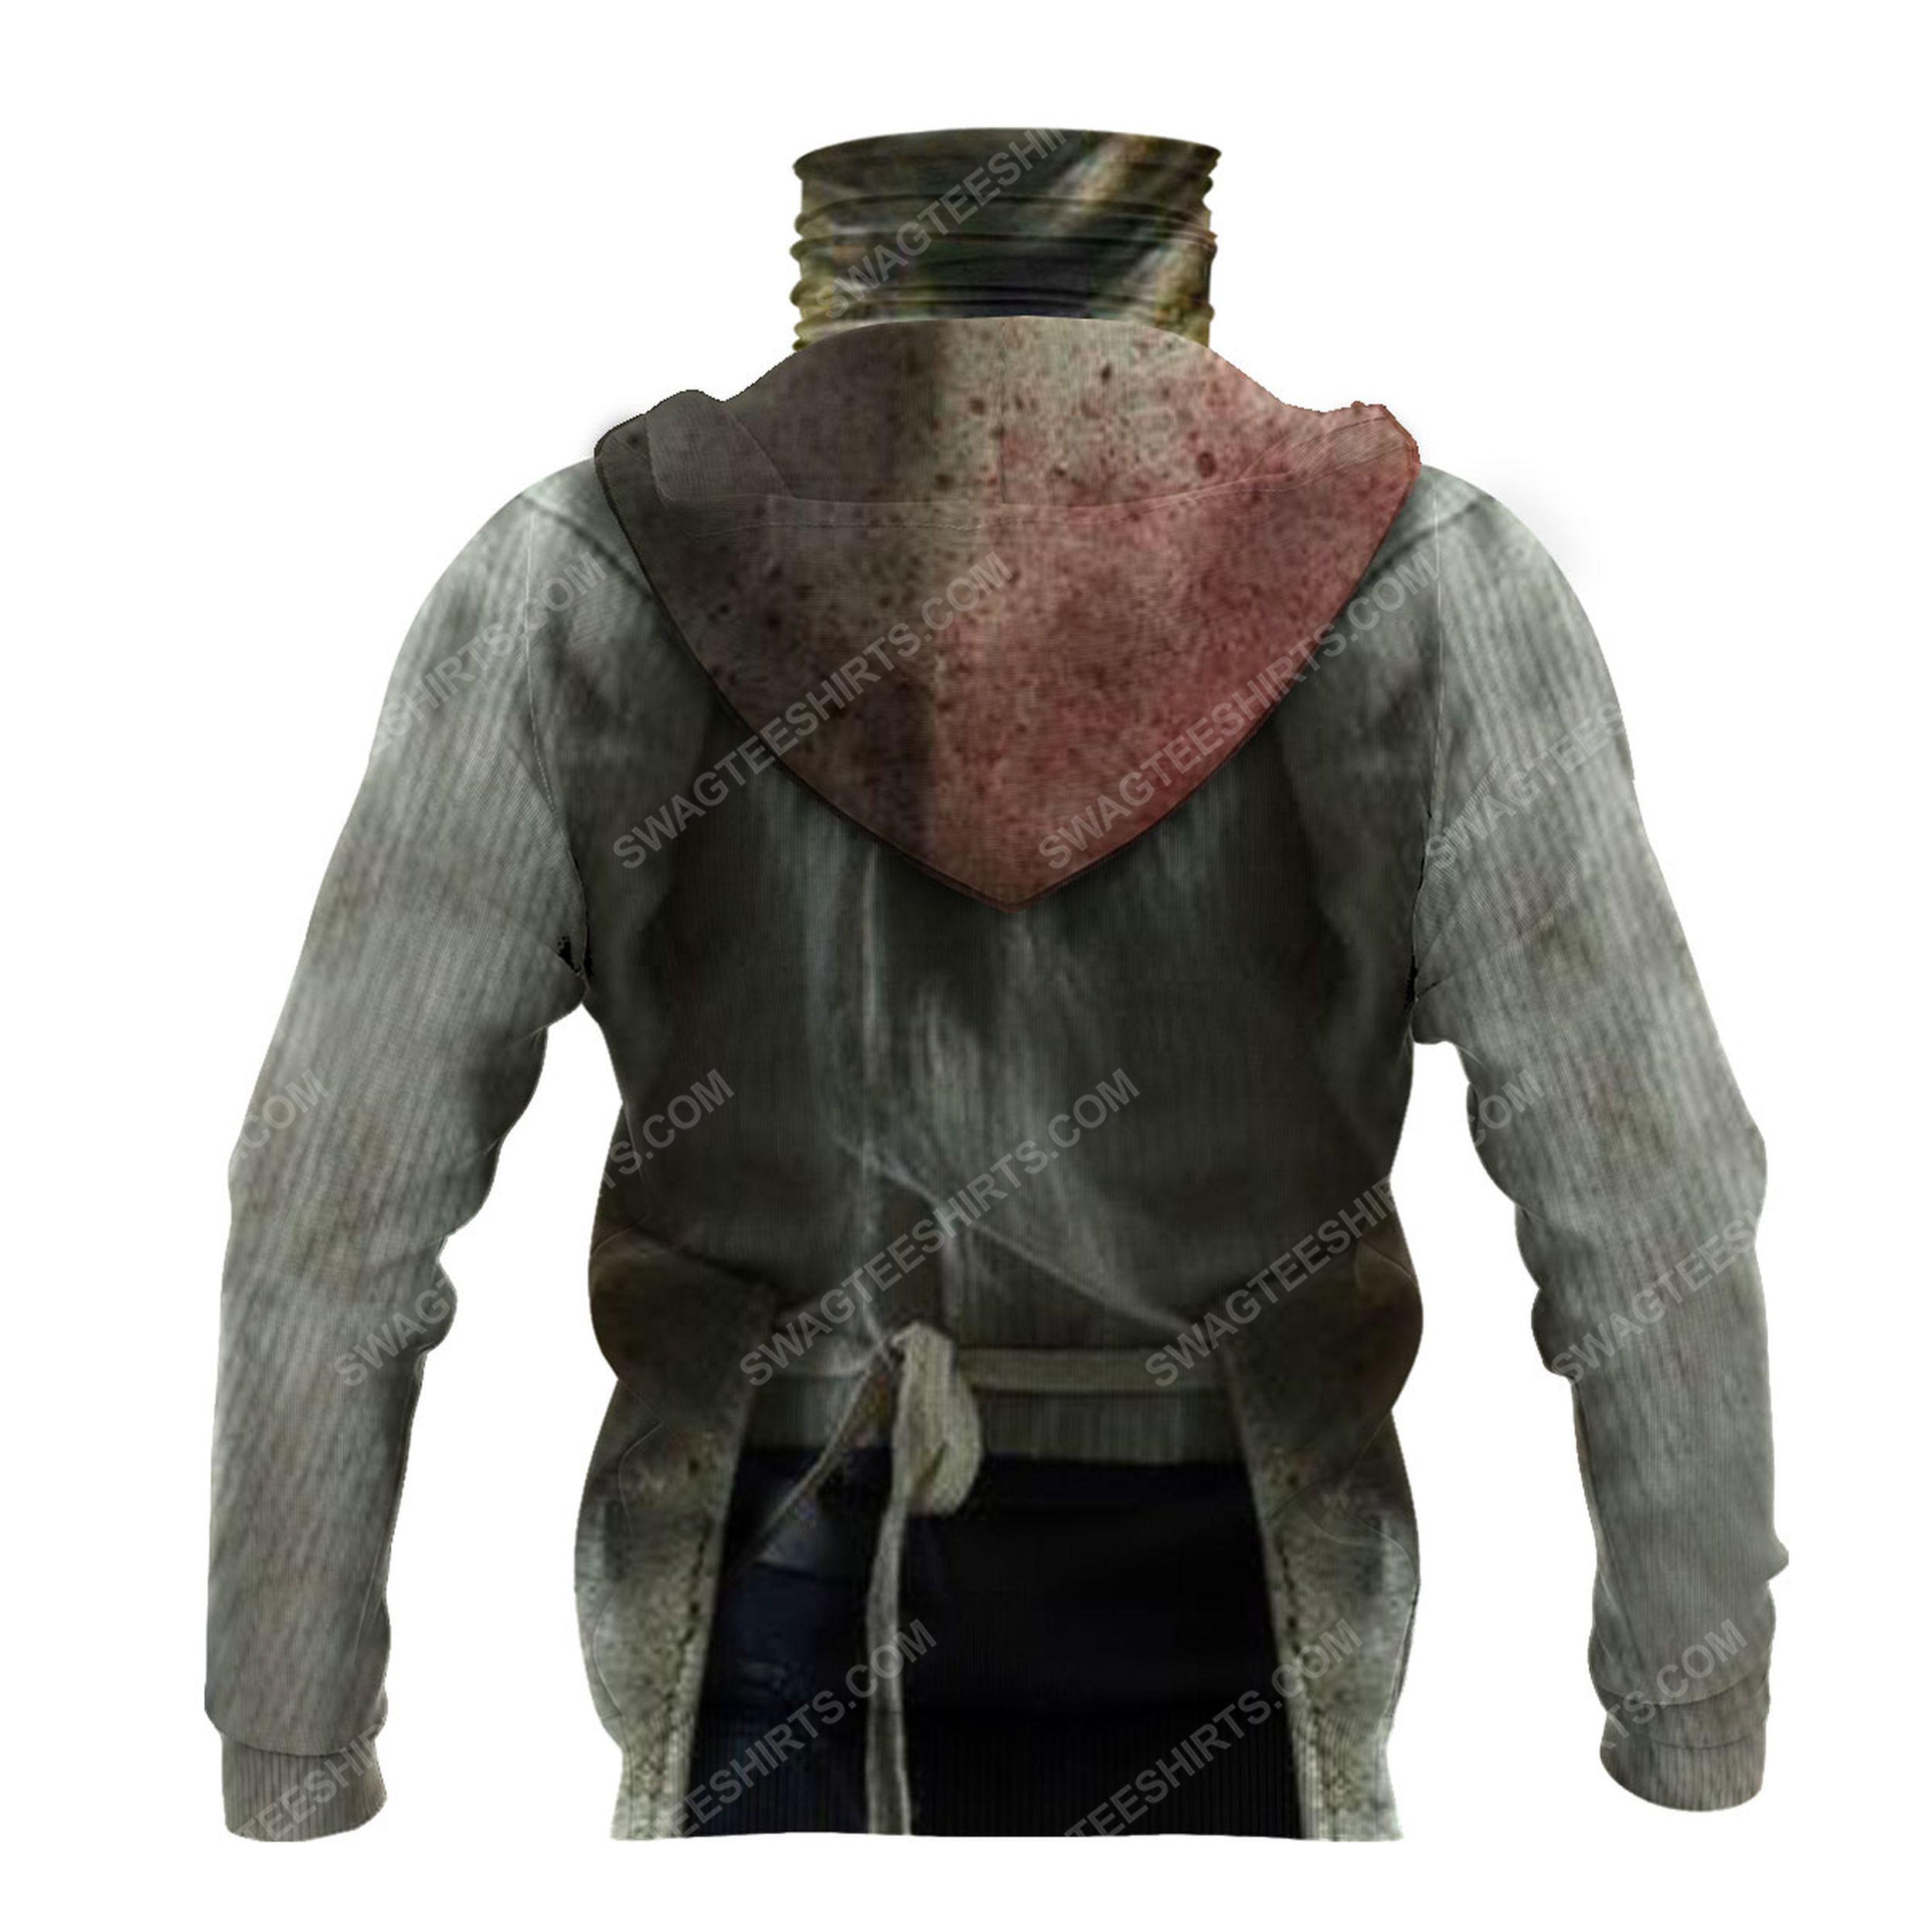 Horror movie leatherface for halloween full print mask hoodie 3(1)